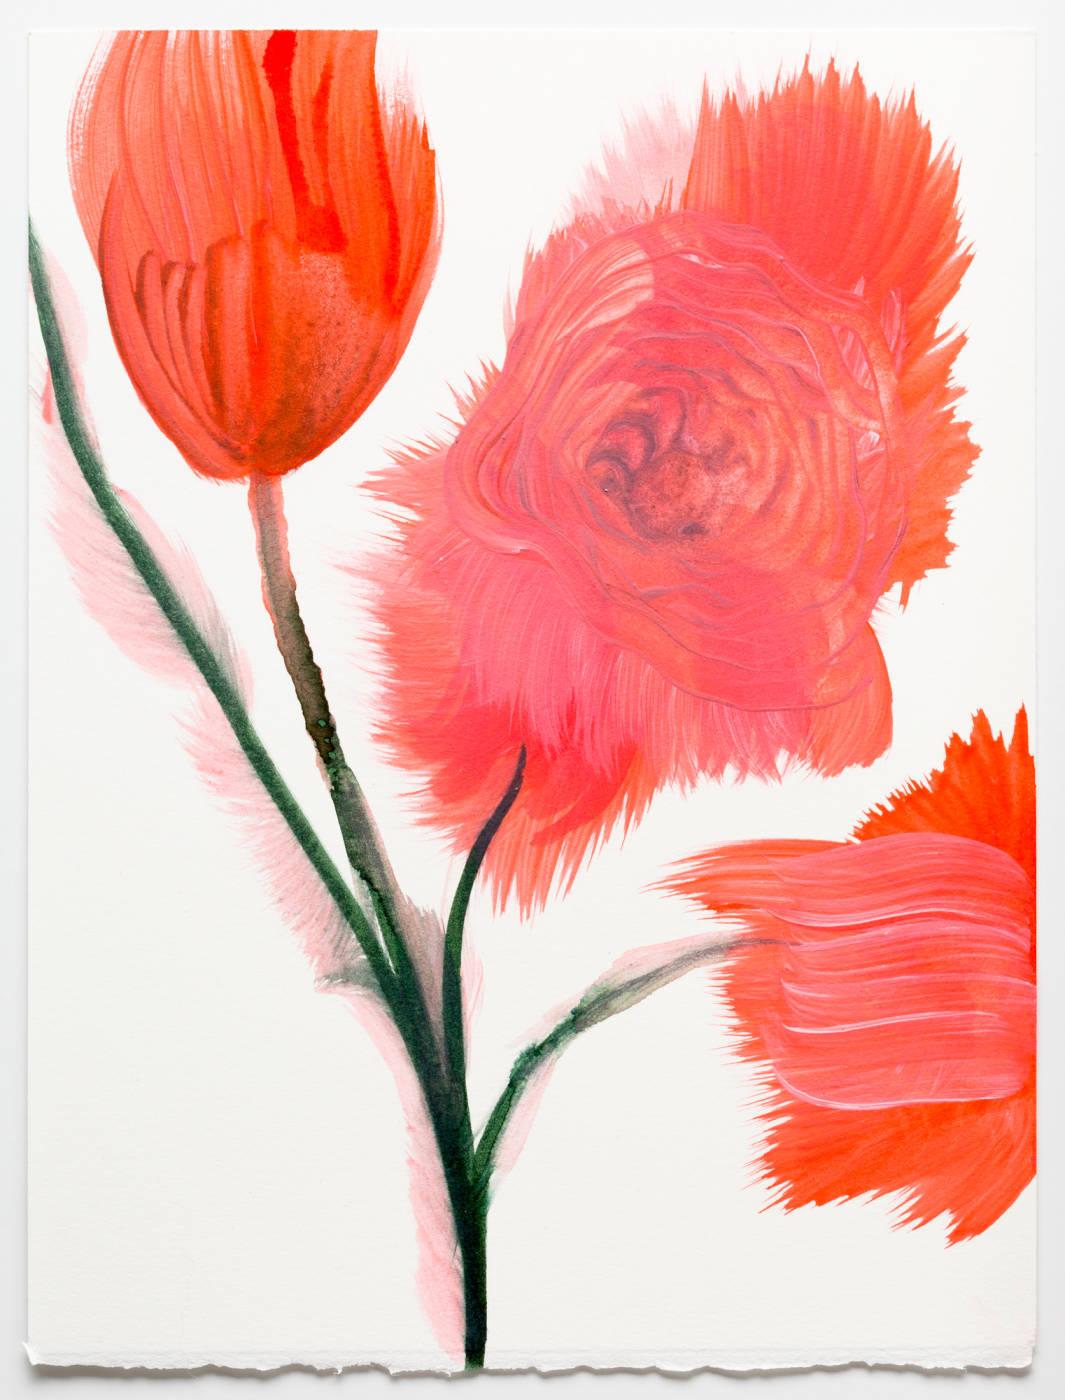 Coral Pink Flower 4